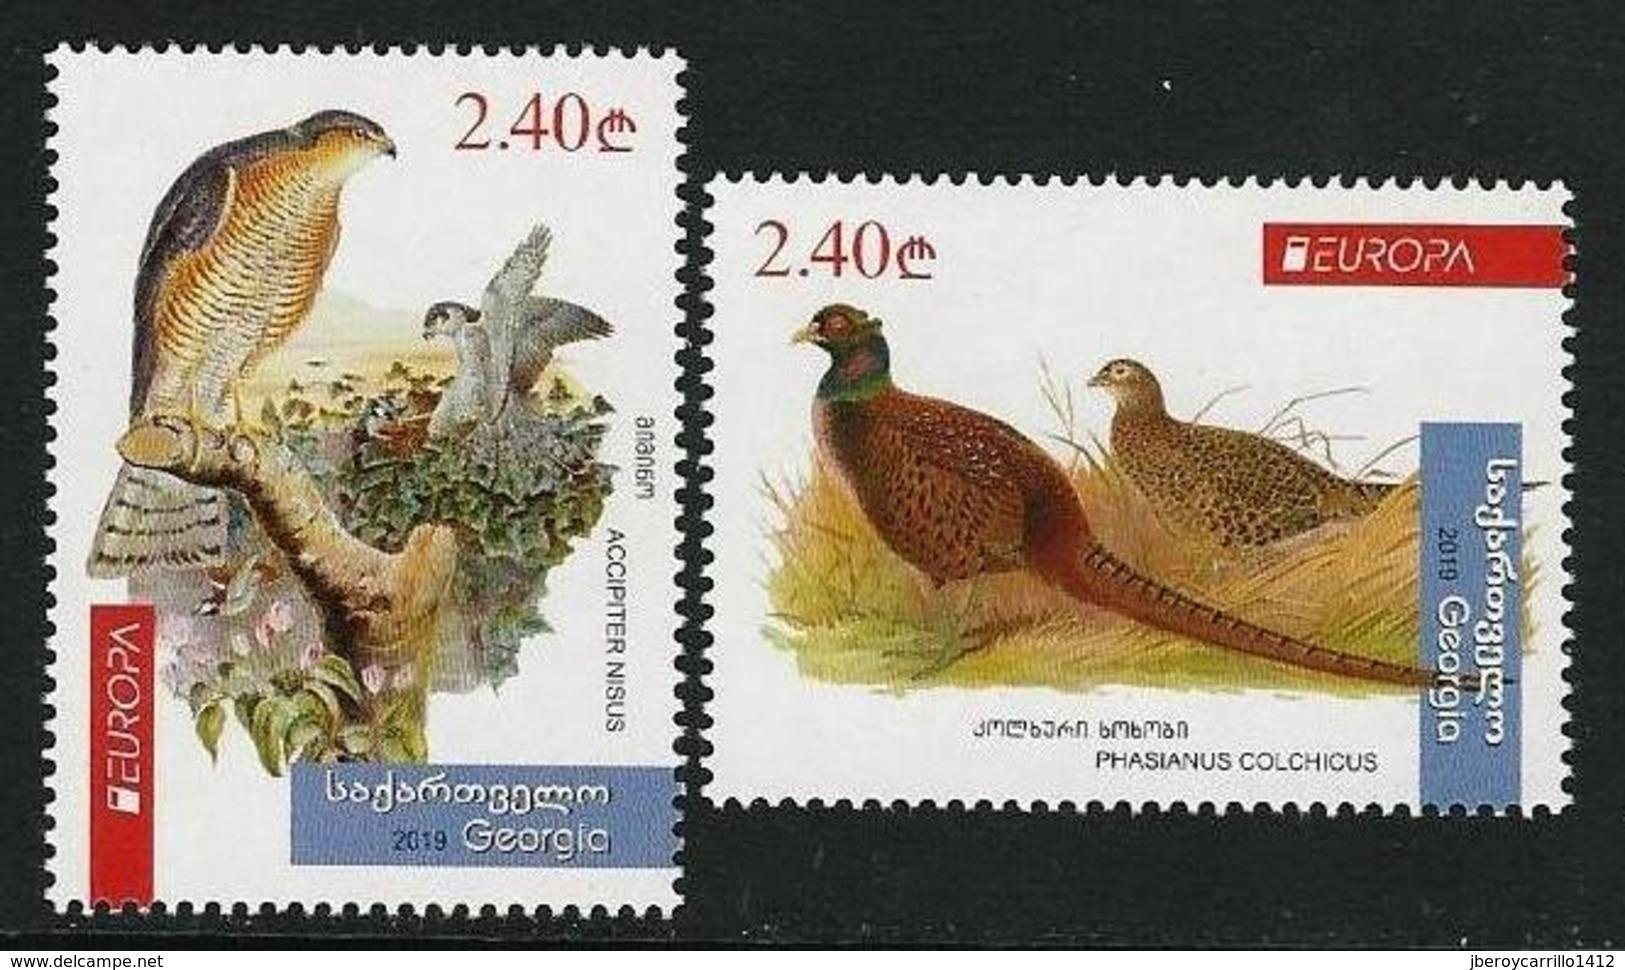 "GEORGIA /GEORGIEN /LA  GÉORGIE -EUROPA 2019 -NATIONAL BIRDS.-""AVES -BIRDS -VÖGEL -OISEAUX""- SERIE De 2 V. - N - 2019"